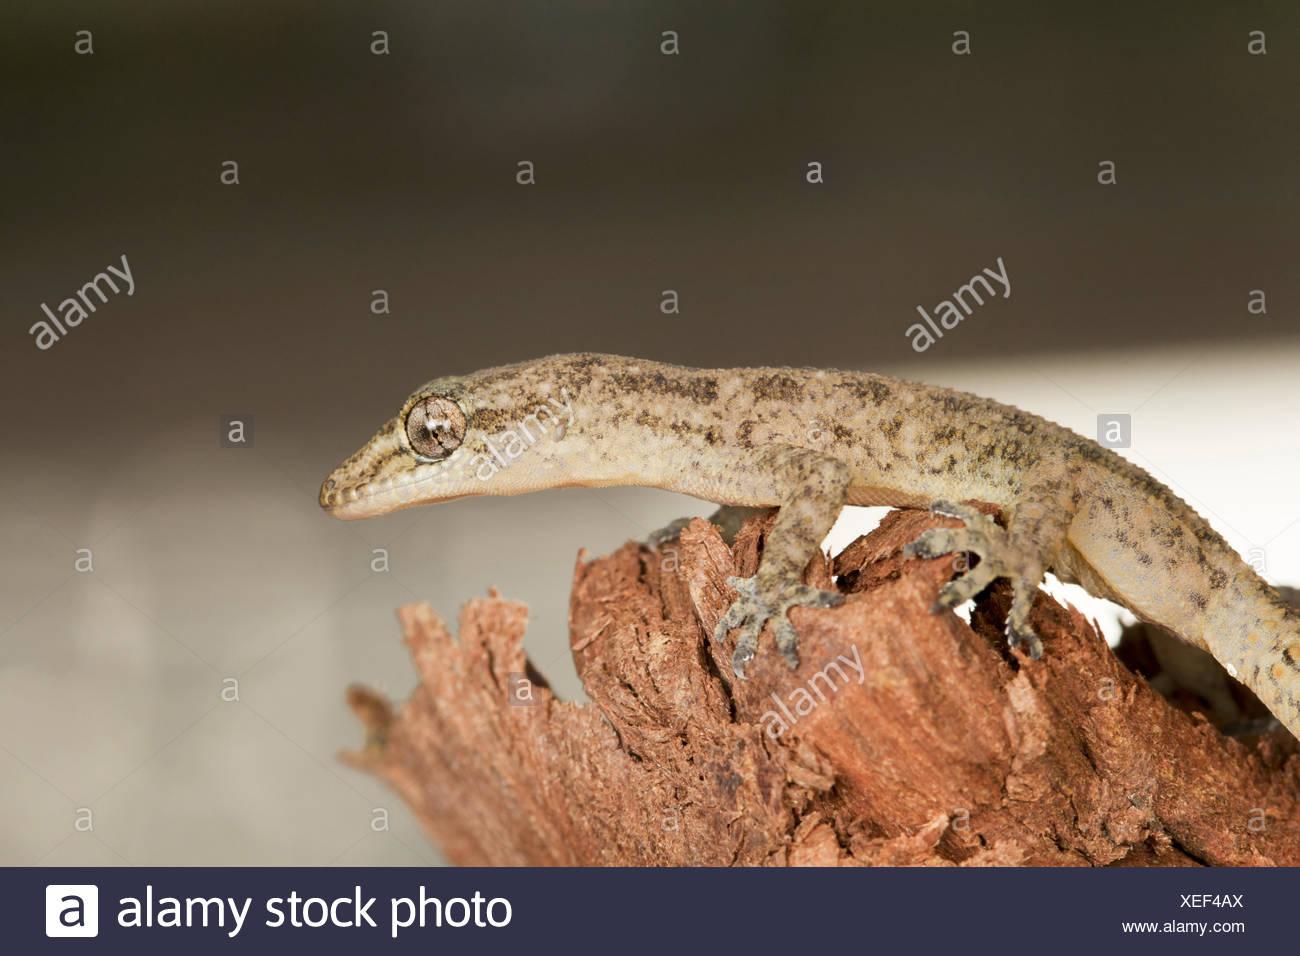 LEAF TOED GECKO, Hemidactylus parvimaculatus, Bhoramdeo Wildlife Sanctuary, Chhattisgarh. Medium sized gecko - Stock Image